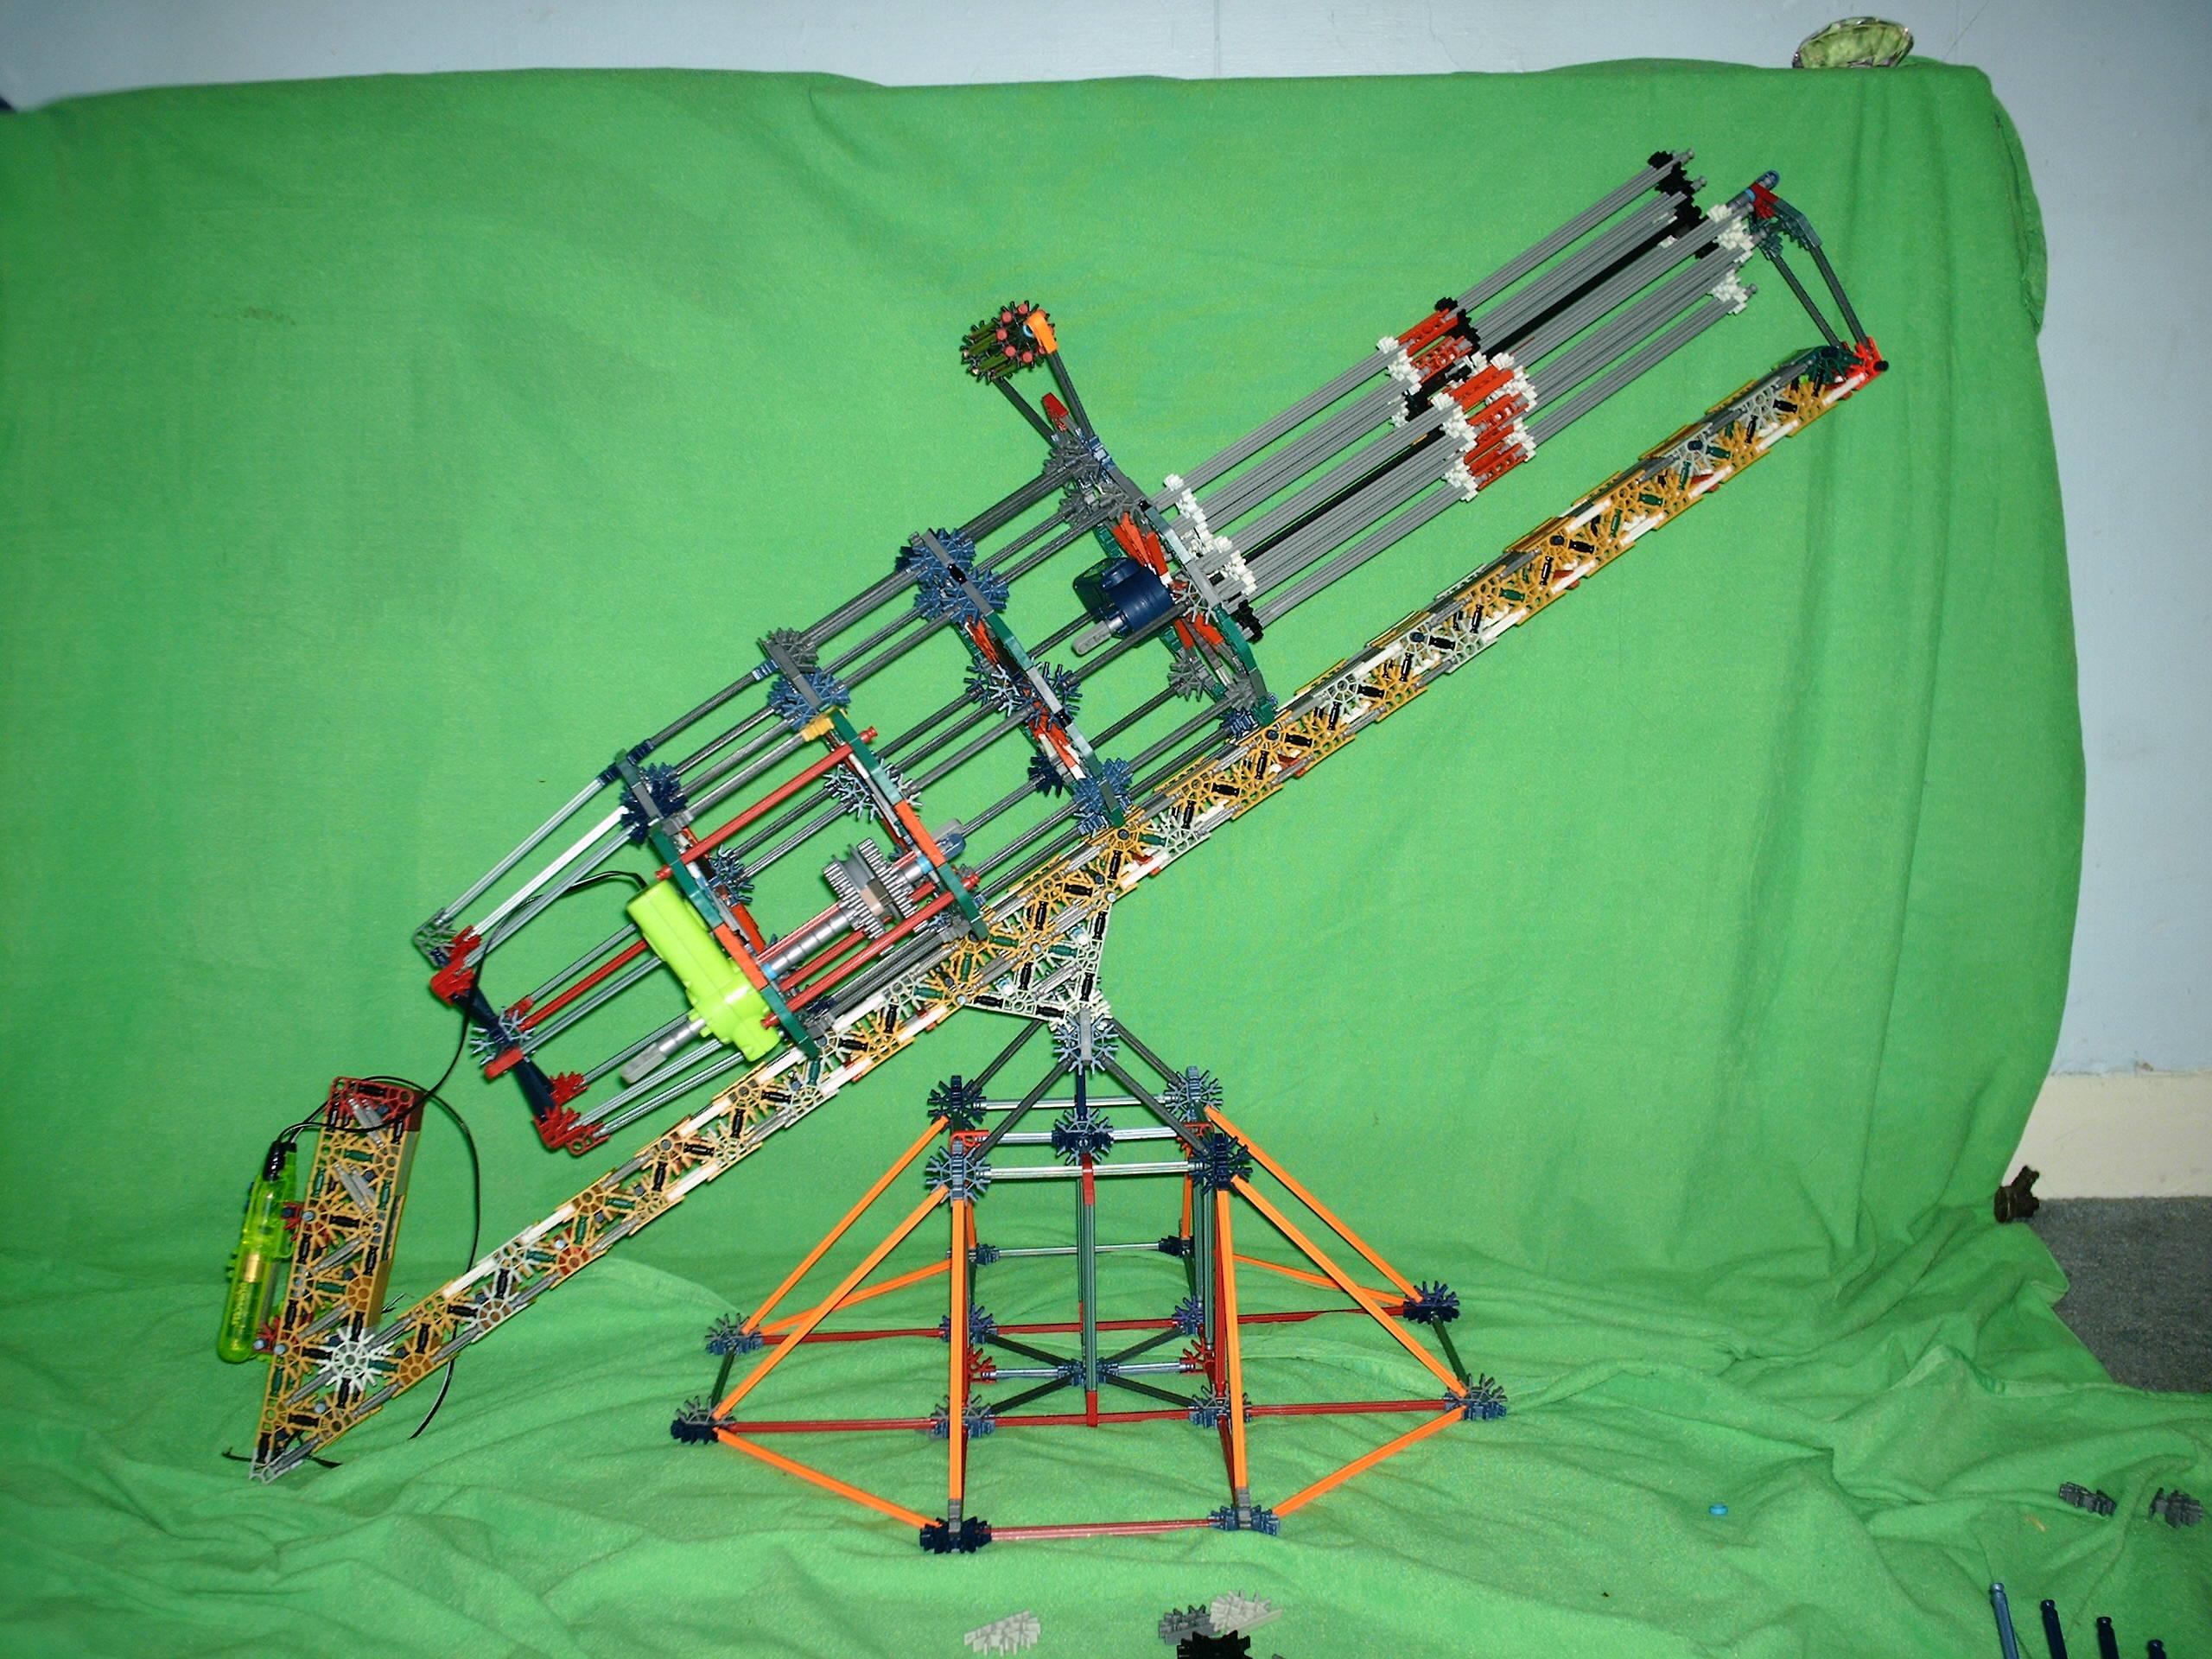 Picture of RMConstruction's Knex Minigun, V2.0